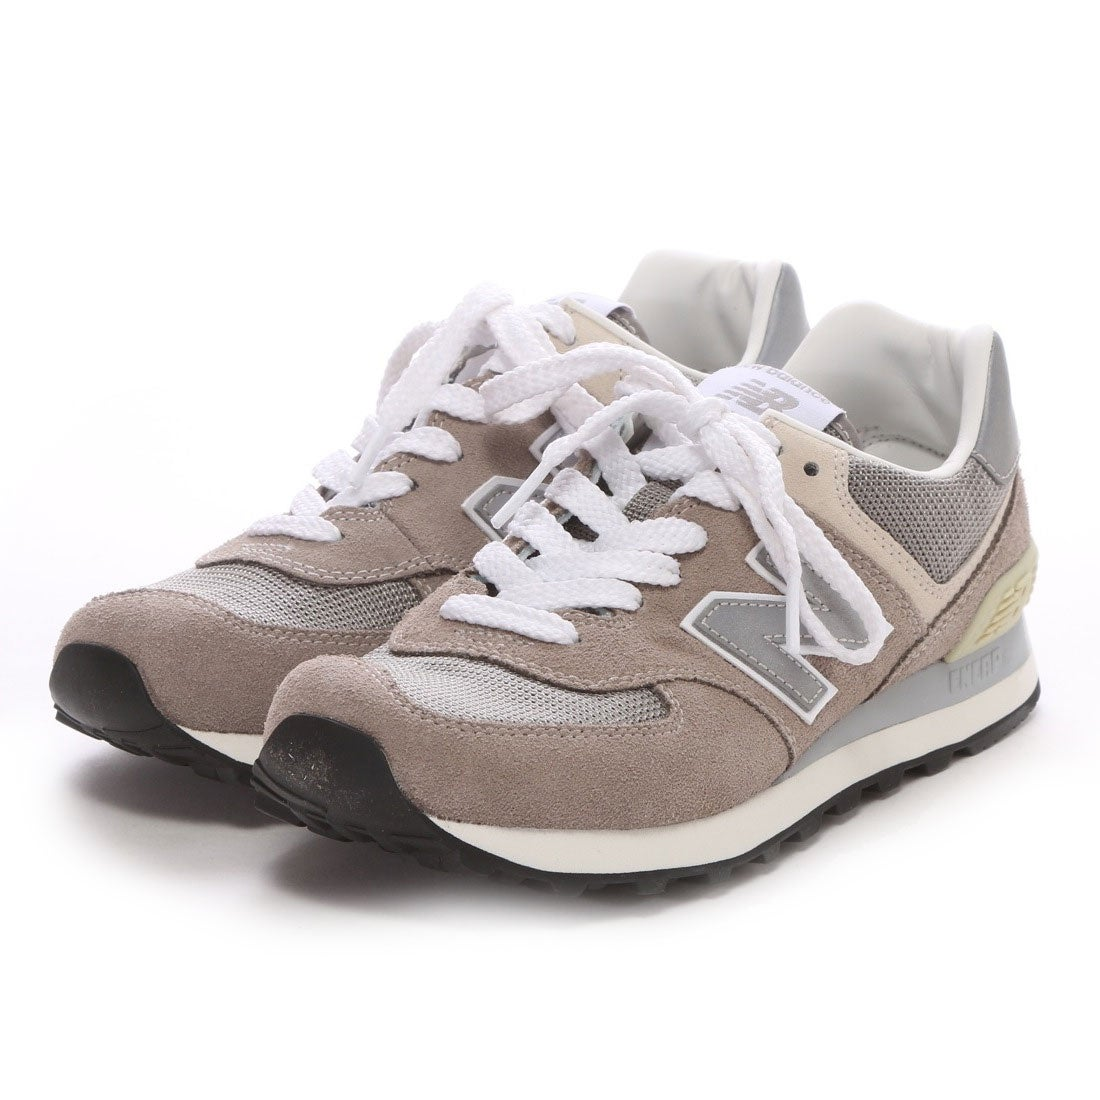 en soldes 77789 3f3bf ニューバランス new balance NB ML574 VG (グレー)-靴 ...